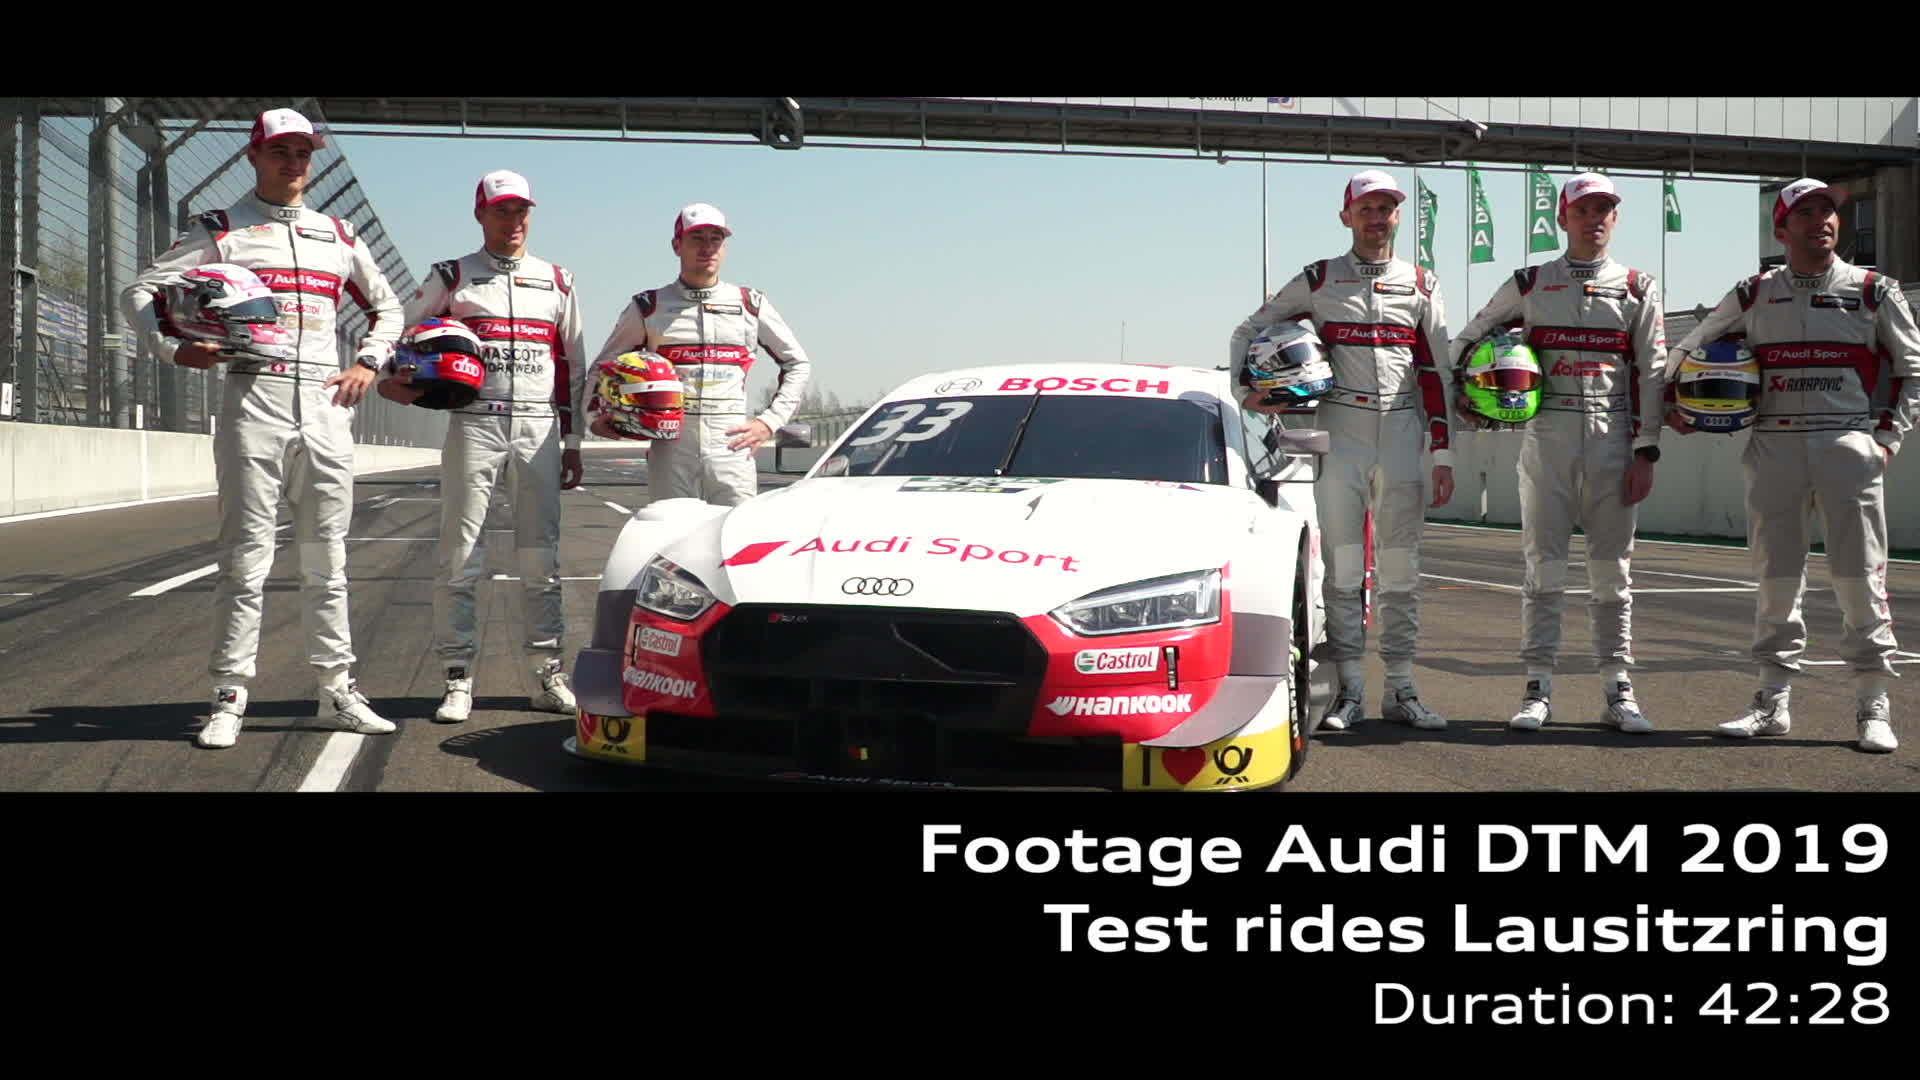 DTM test rides Lausitzring (footage)